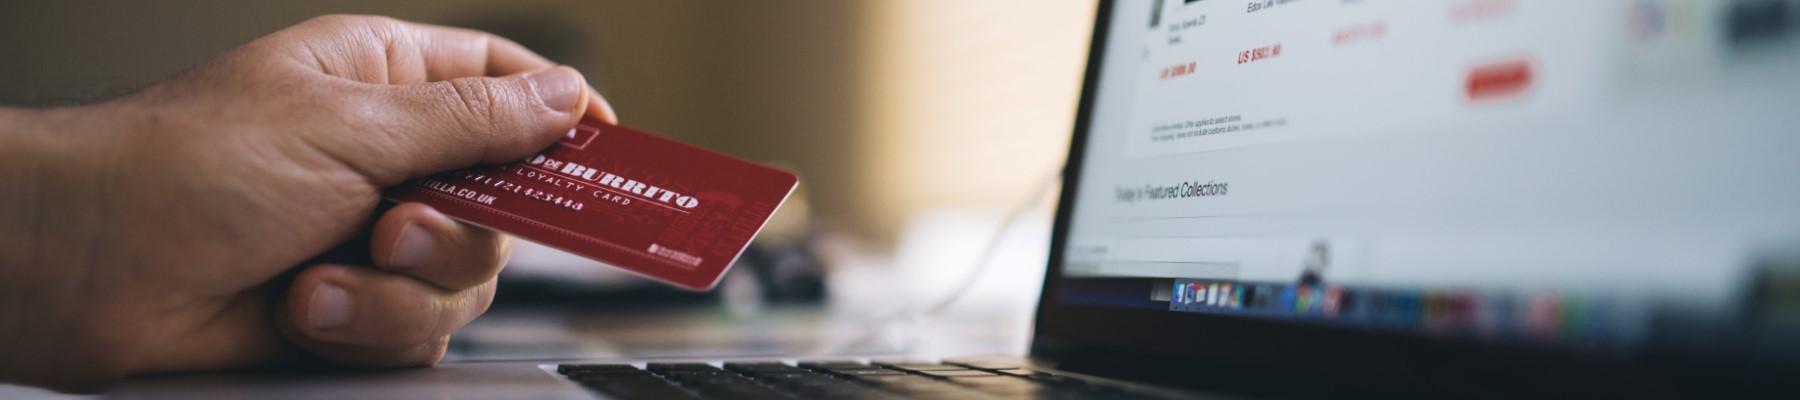 E-Commerce Data | Kaggle